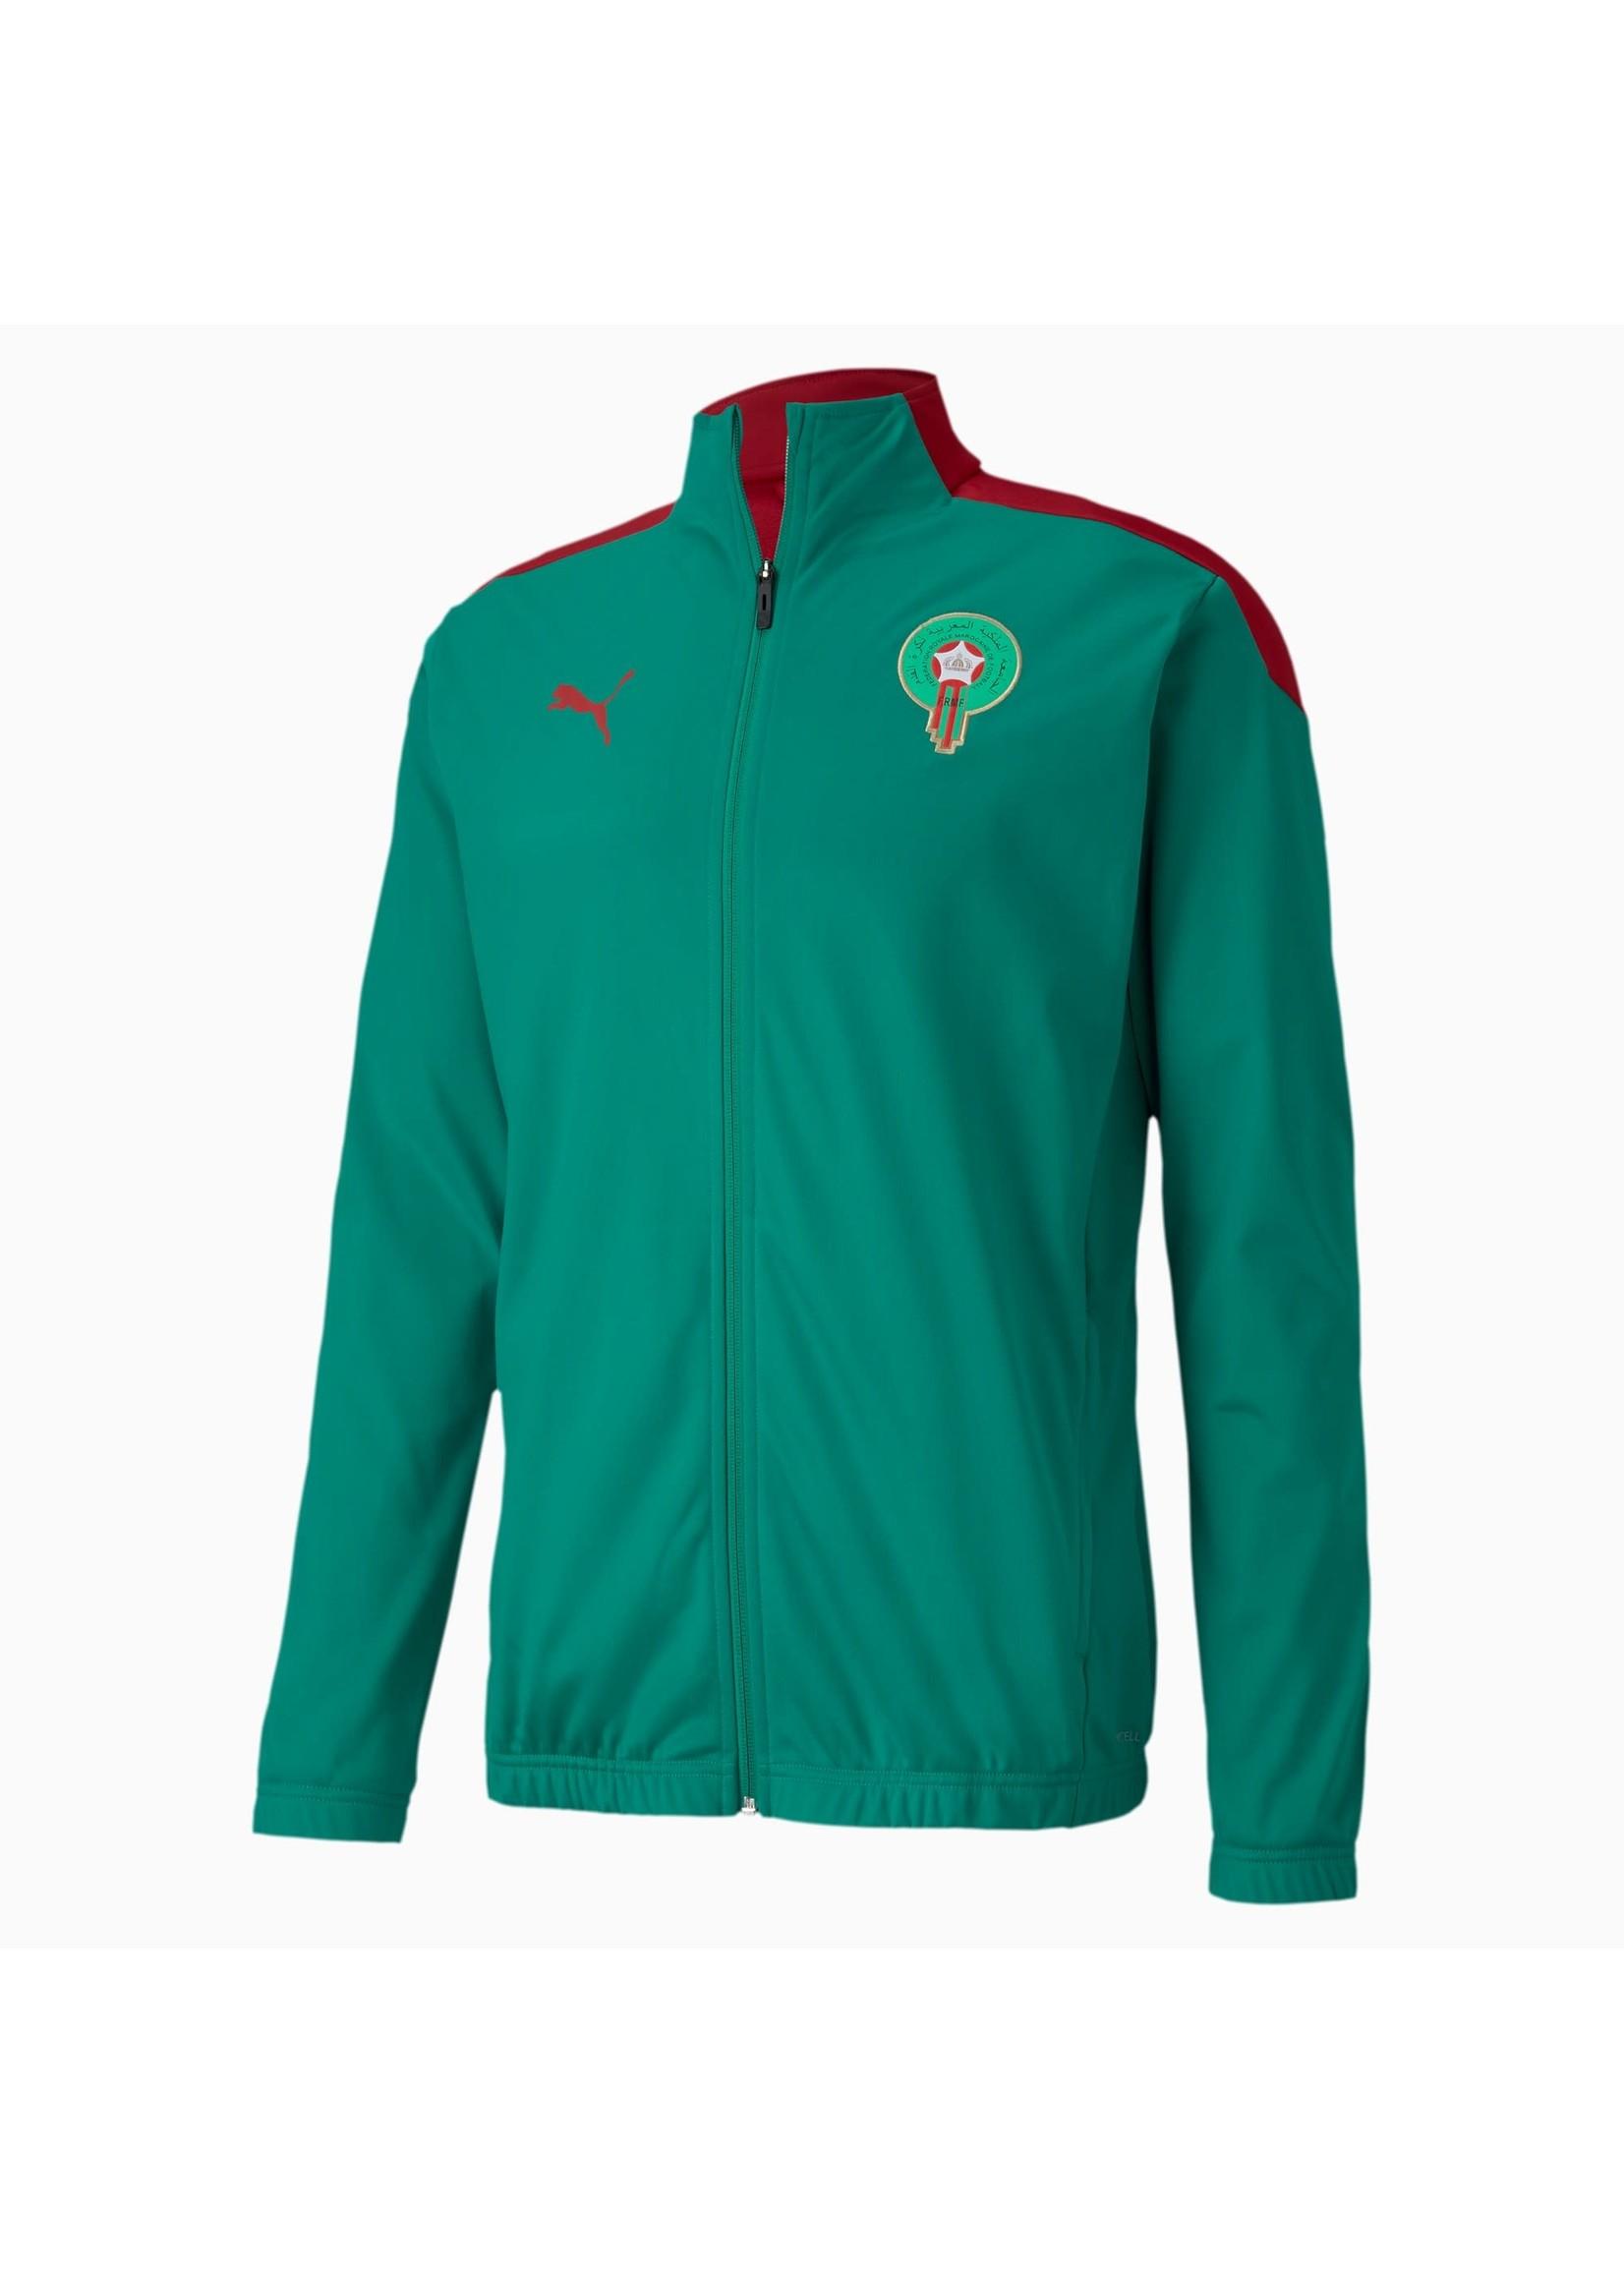 Puma Morocco Track Jacket - Full Zip - 757666 05